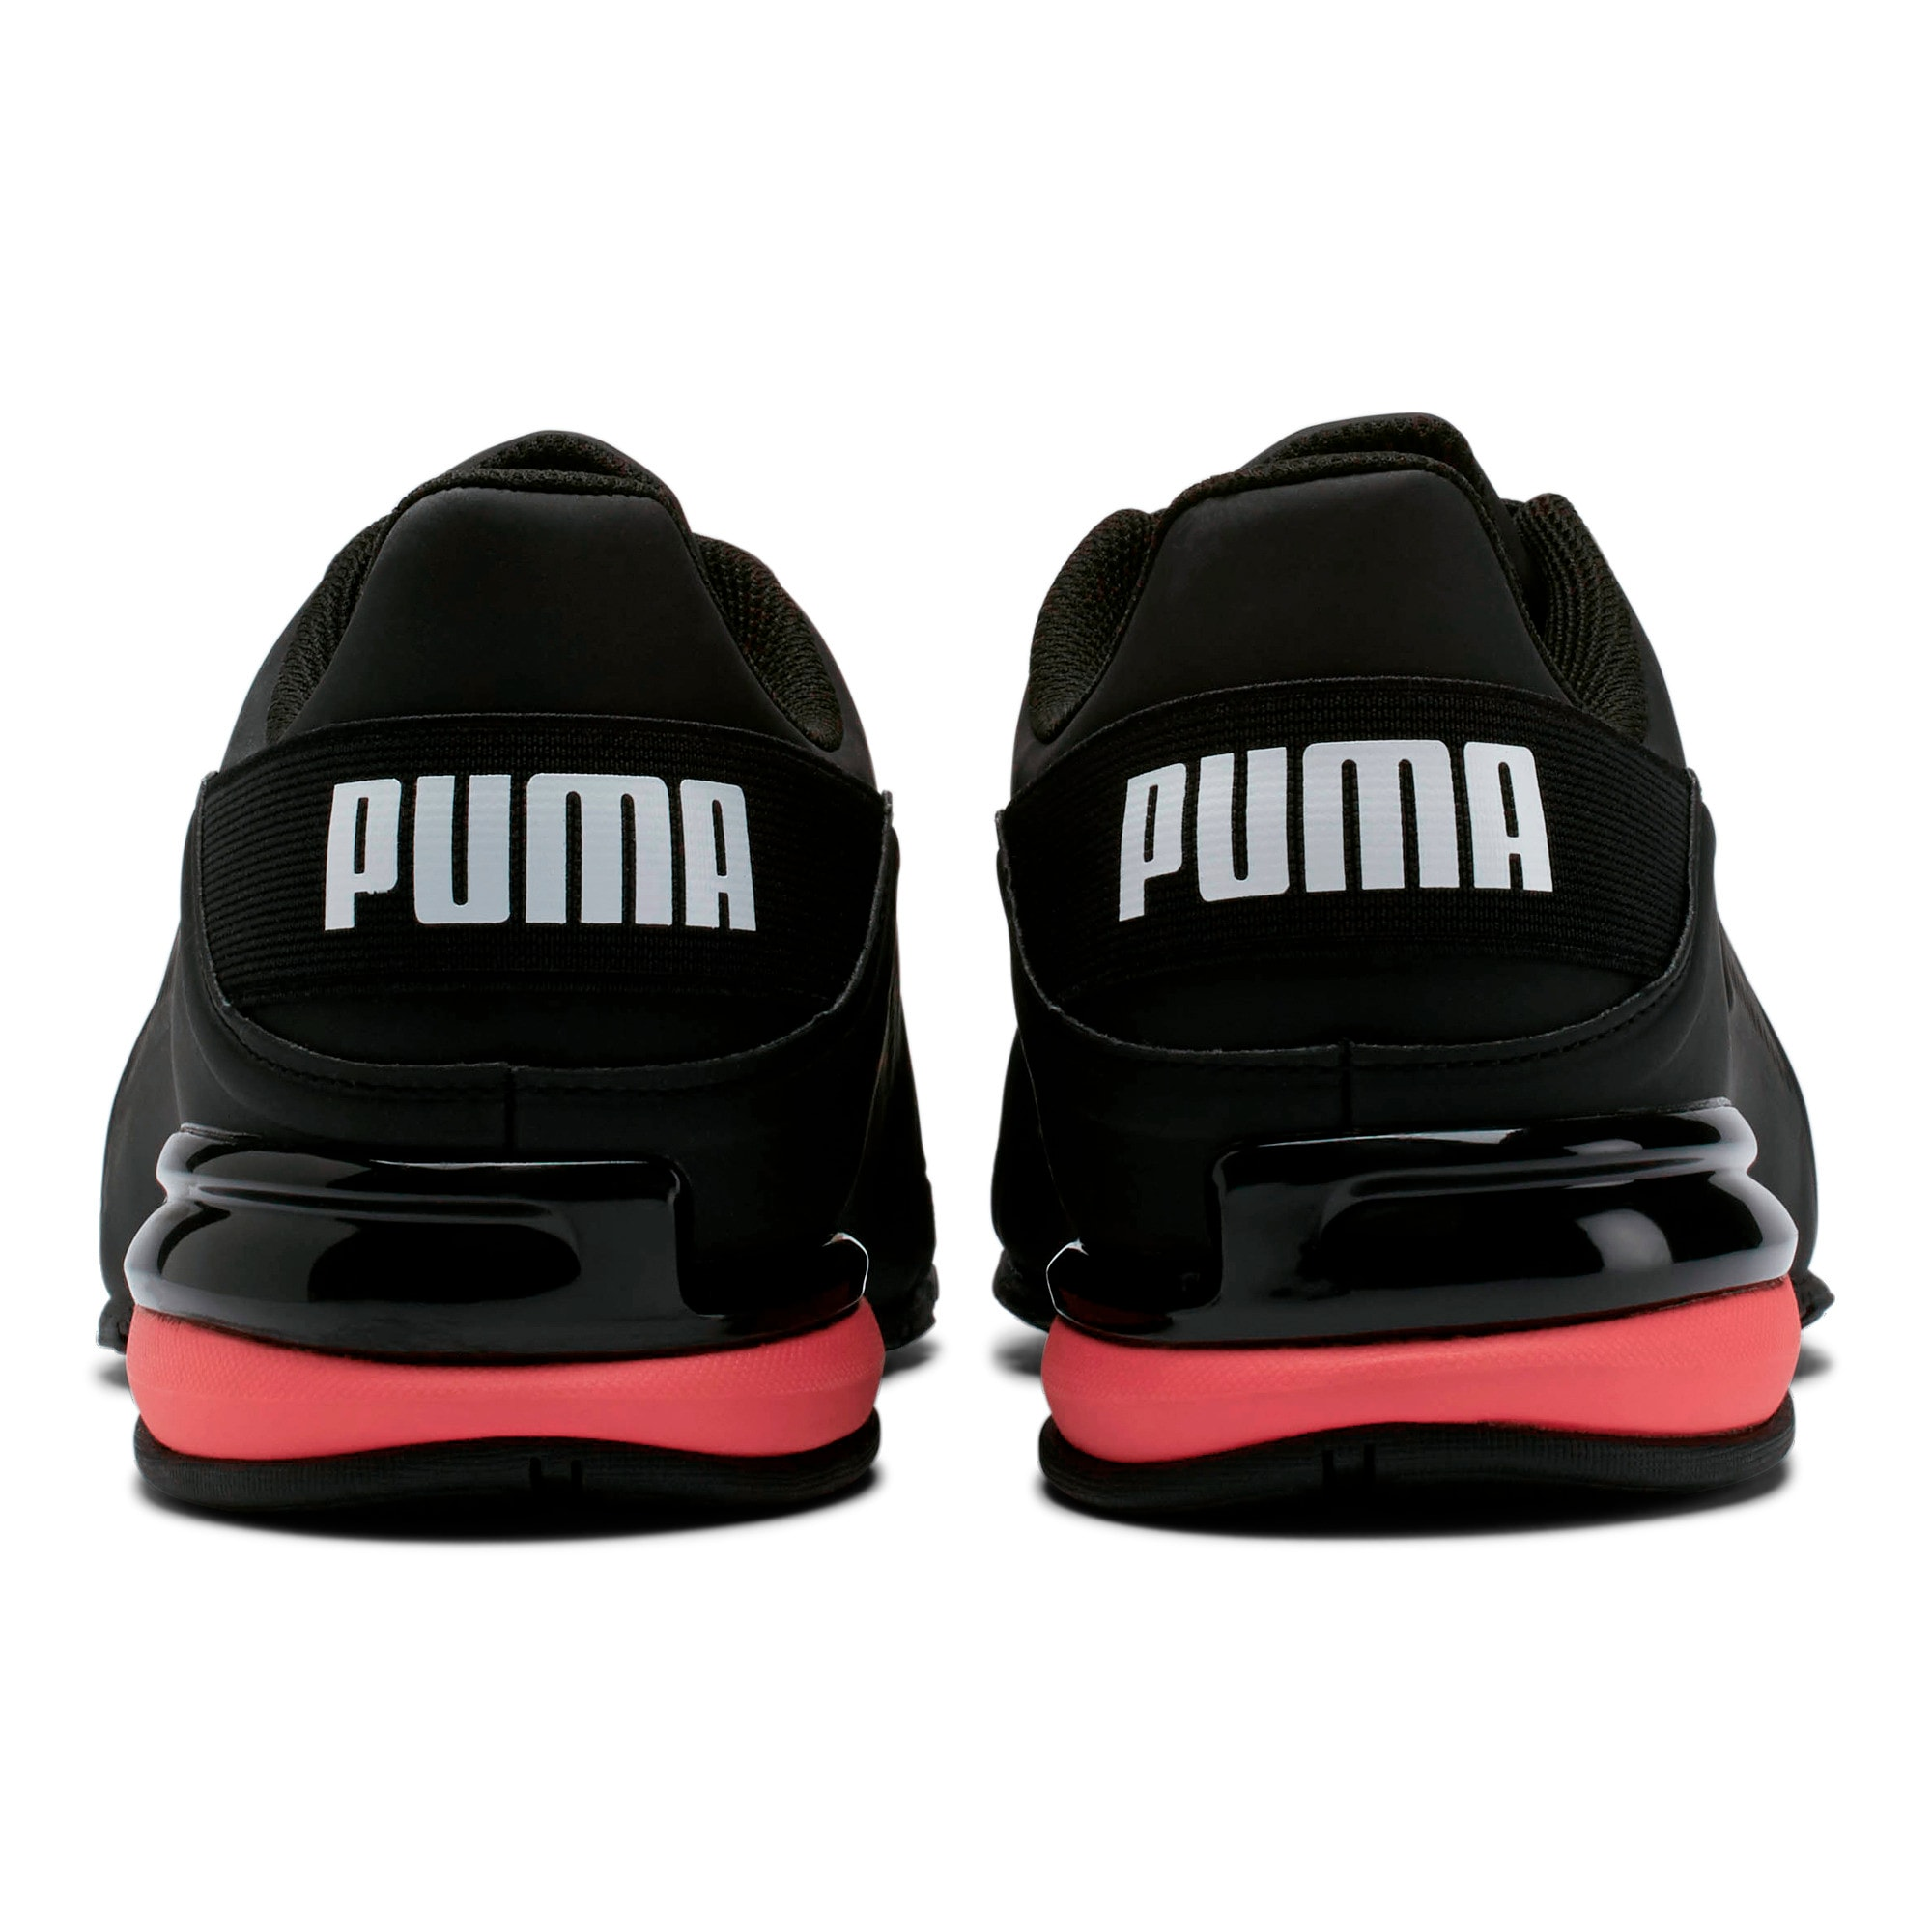 Thumbnail 4 of Viz Runner Men's Running Shoes, Puma Black-Puma White, medium